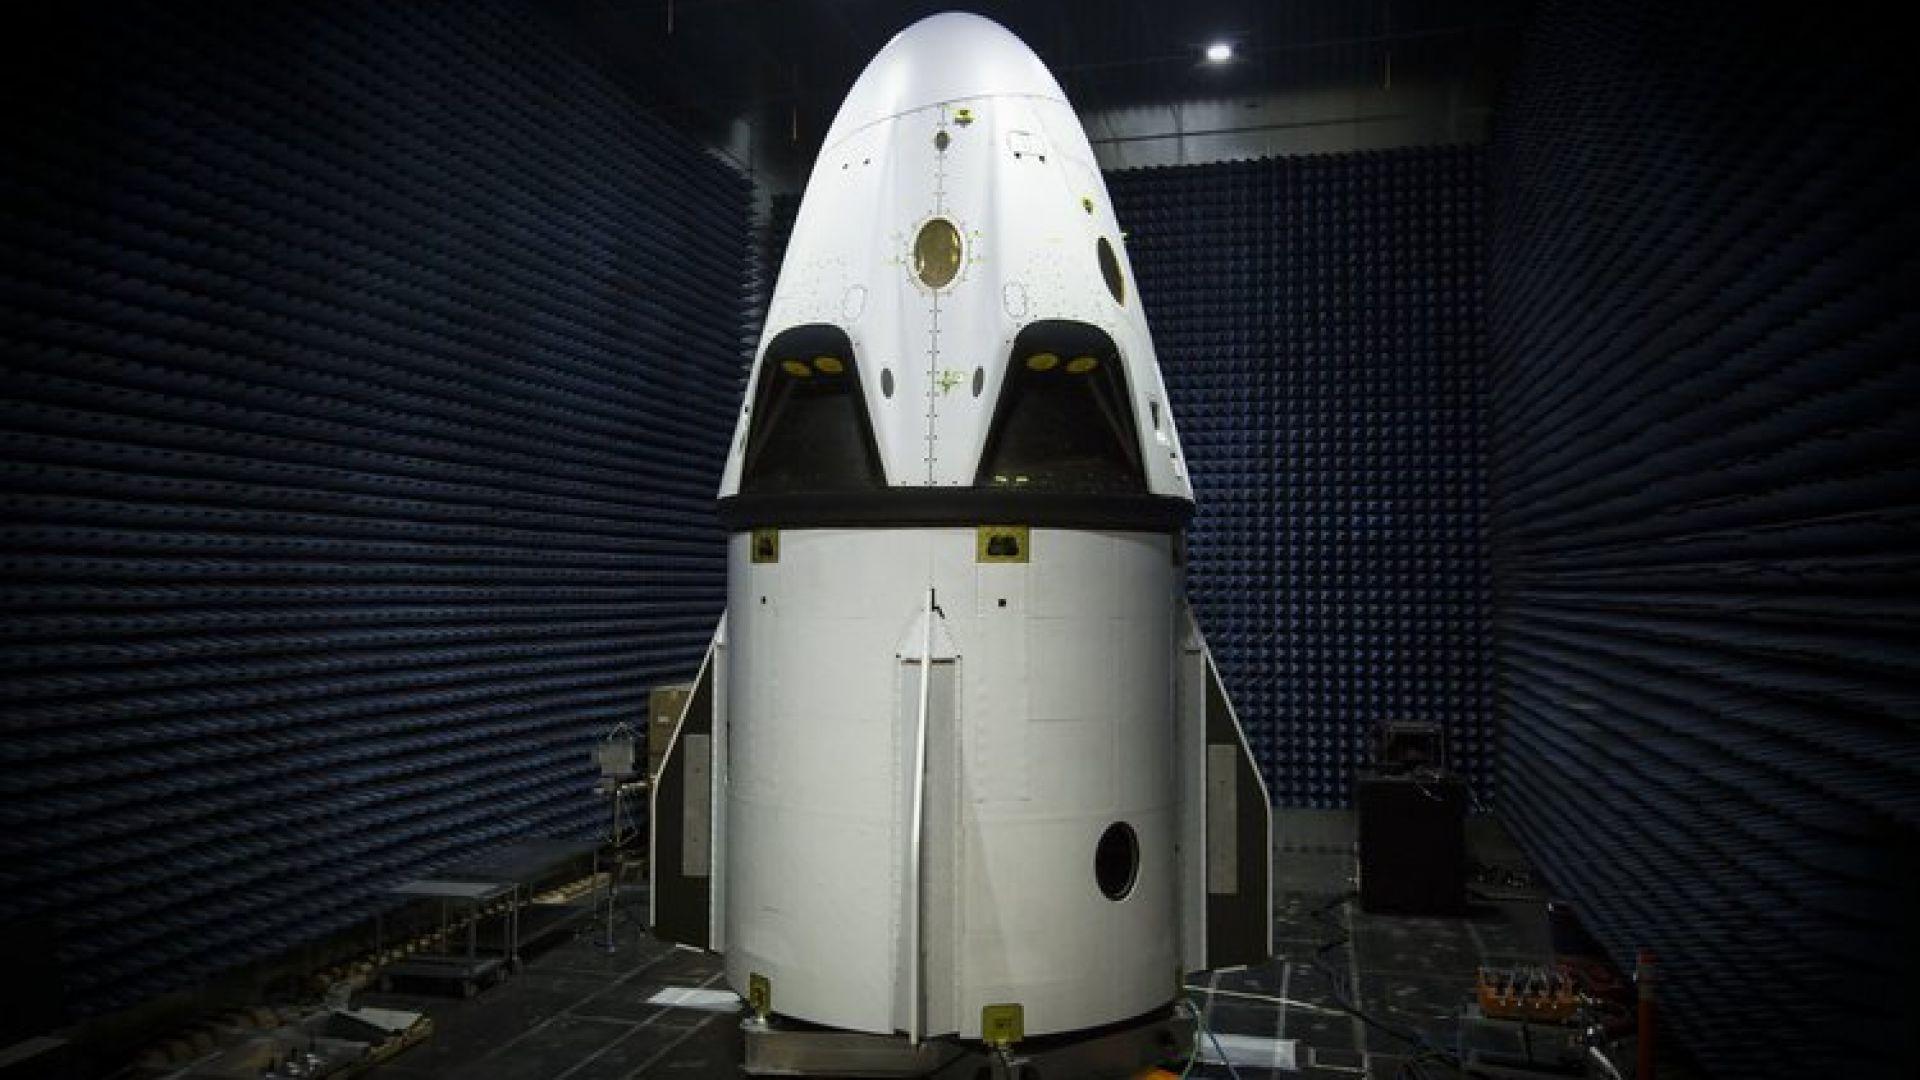 Космическият кораб на SpaceX полита утре